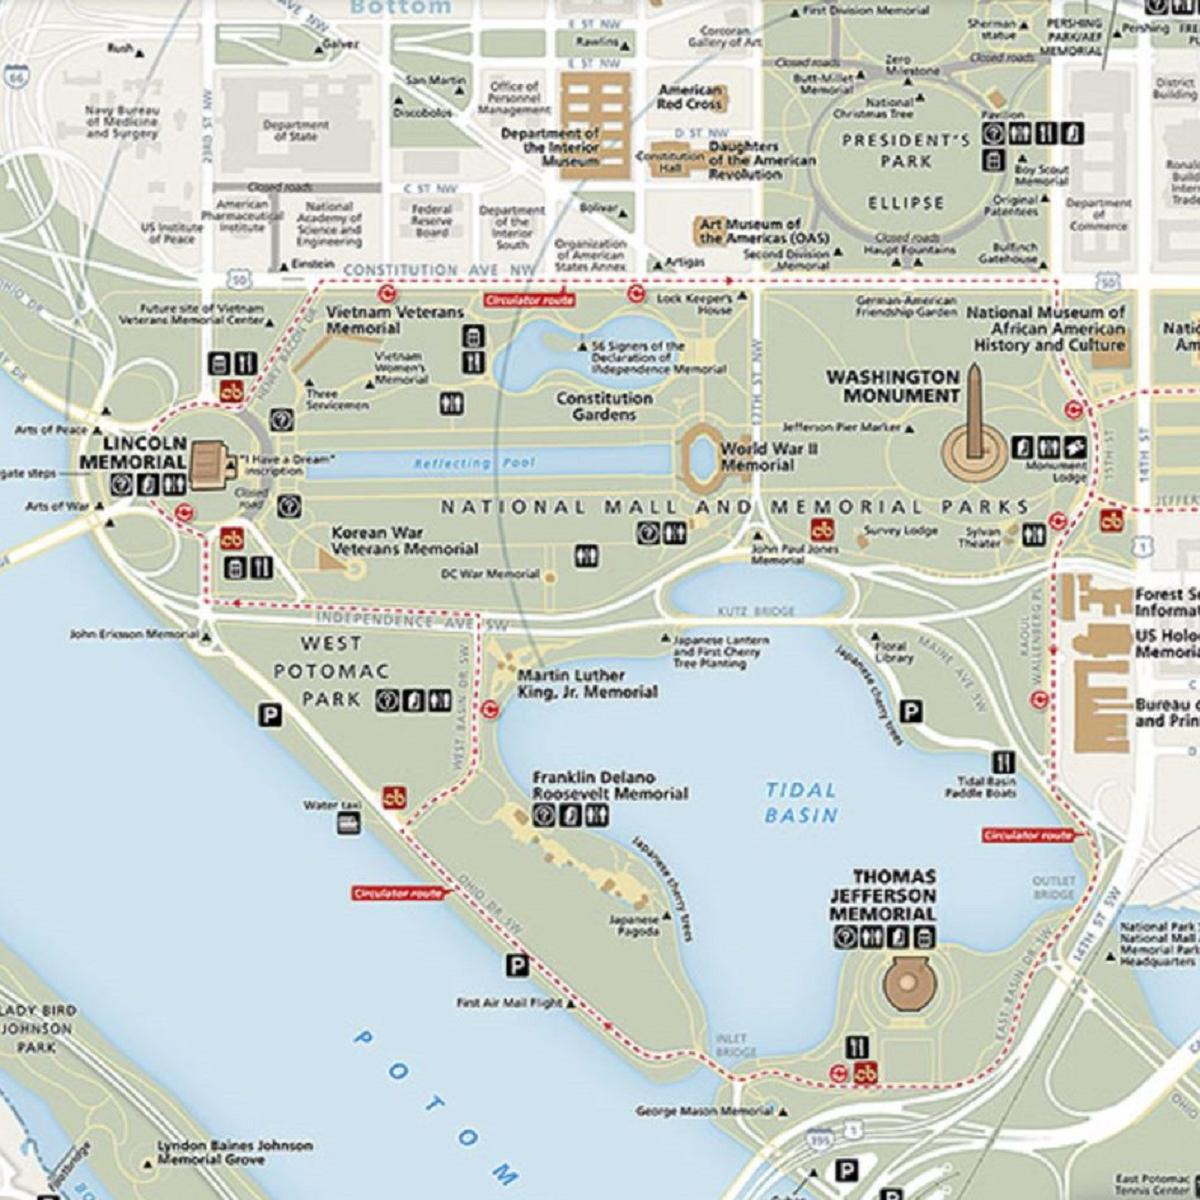 image relating to Printable Map of Washington Dc Mall called Maps - Washington, DC, Fourth of July Bash (U.S.